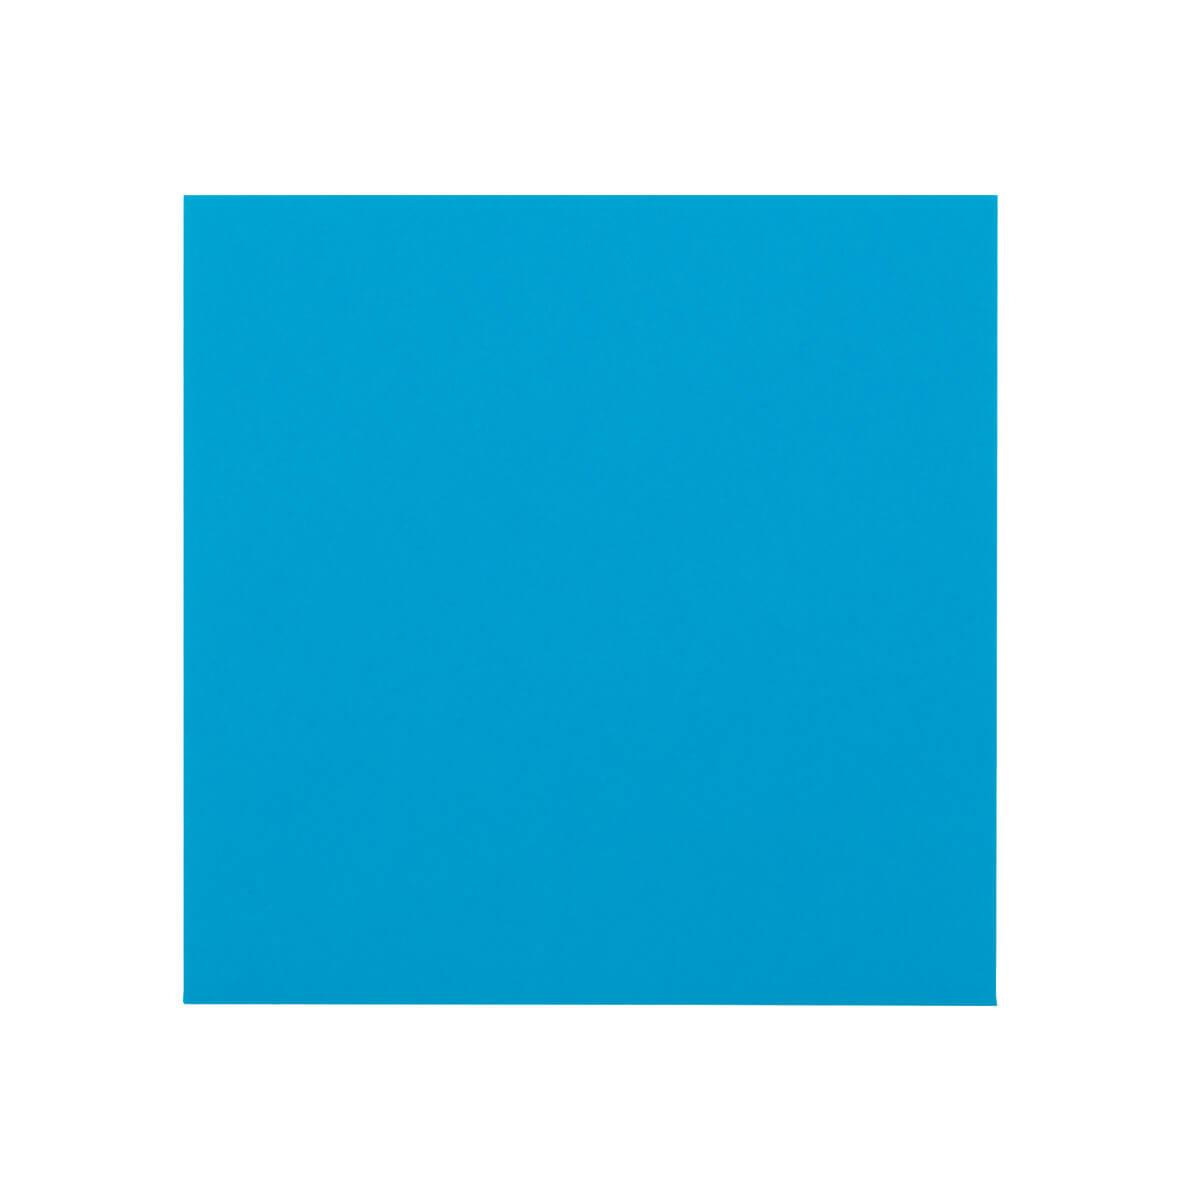 BRIGHT BLUE 130MM SQUARE ENVELOPES 120GSM